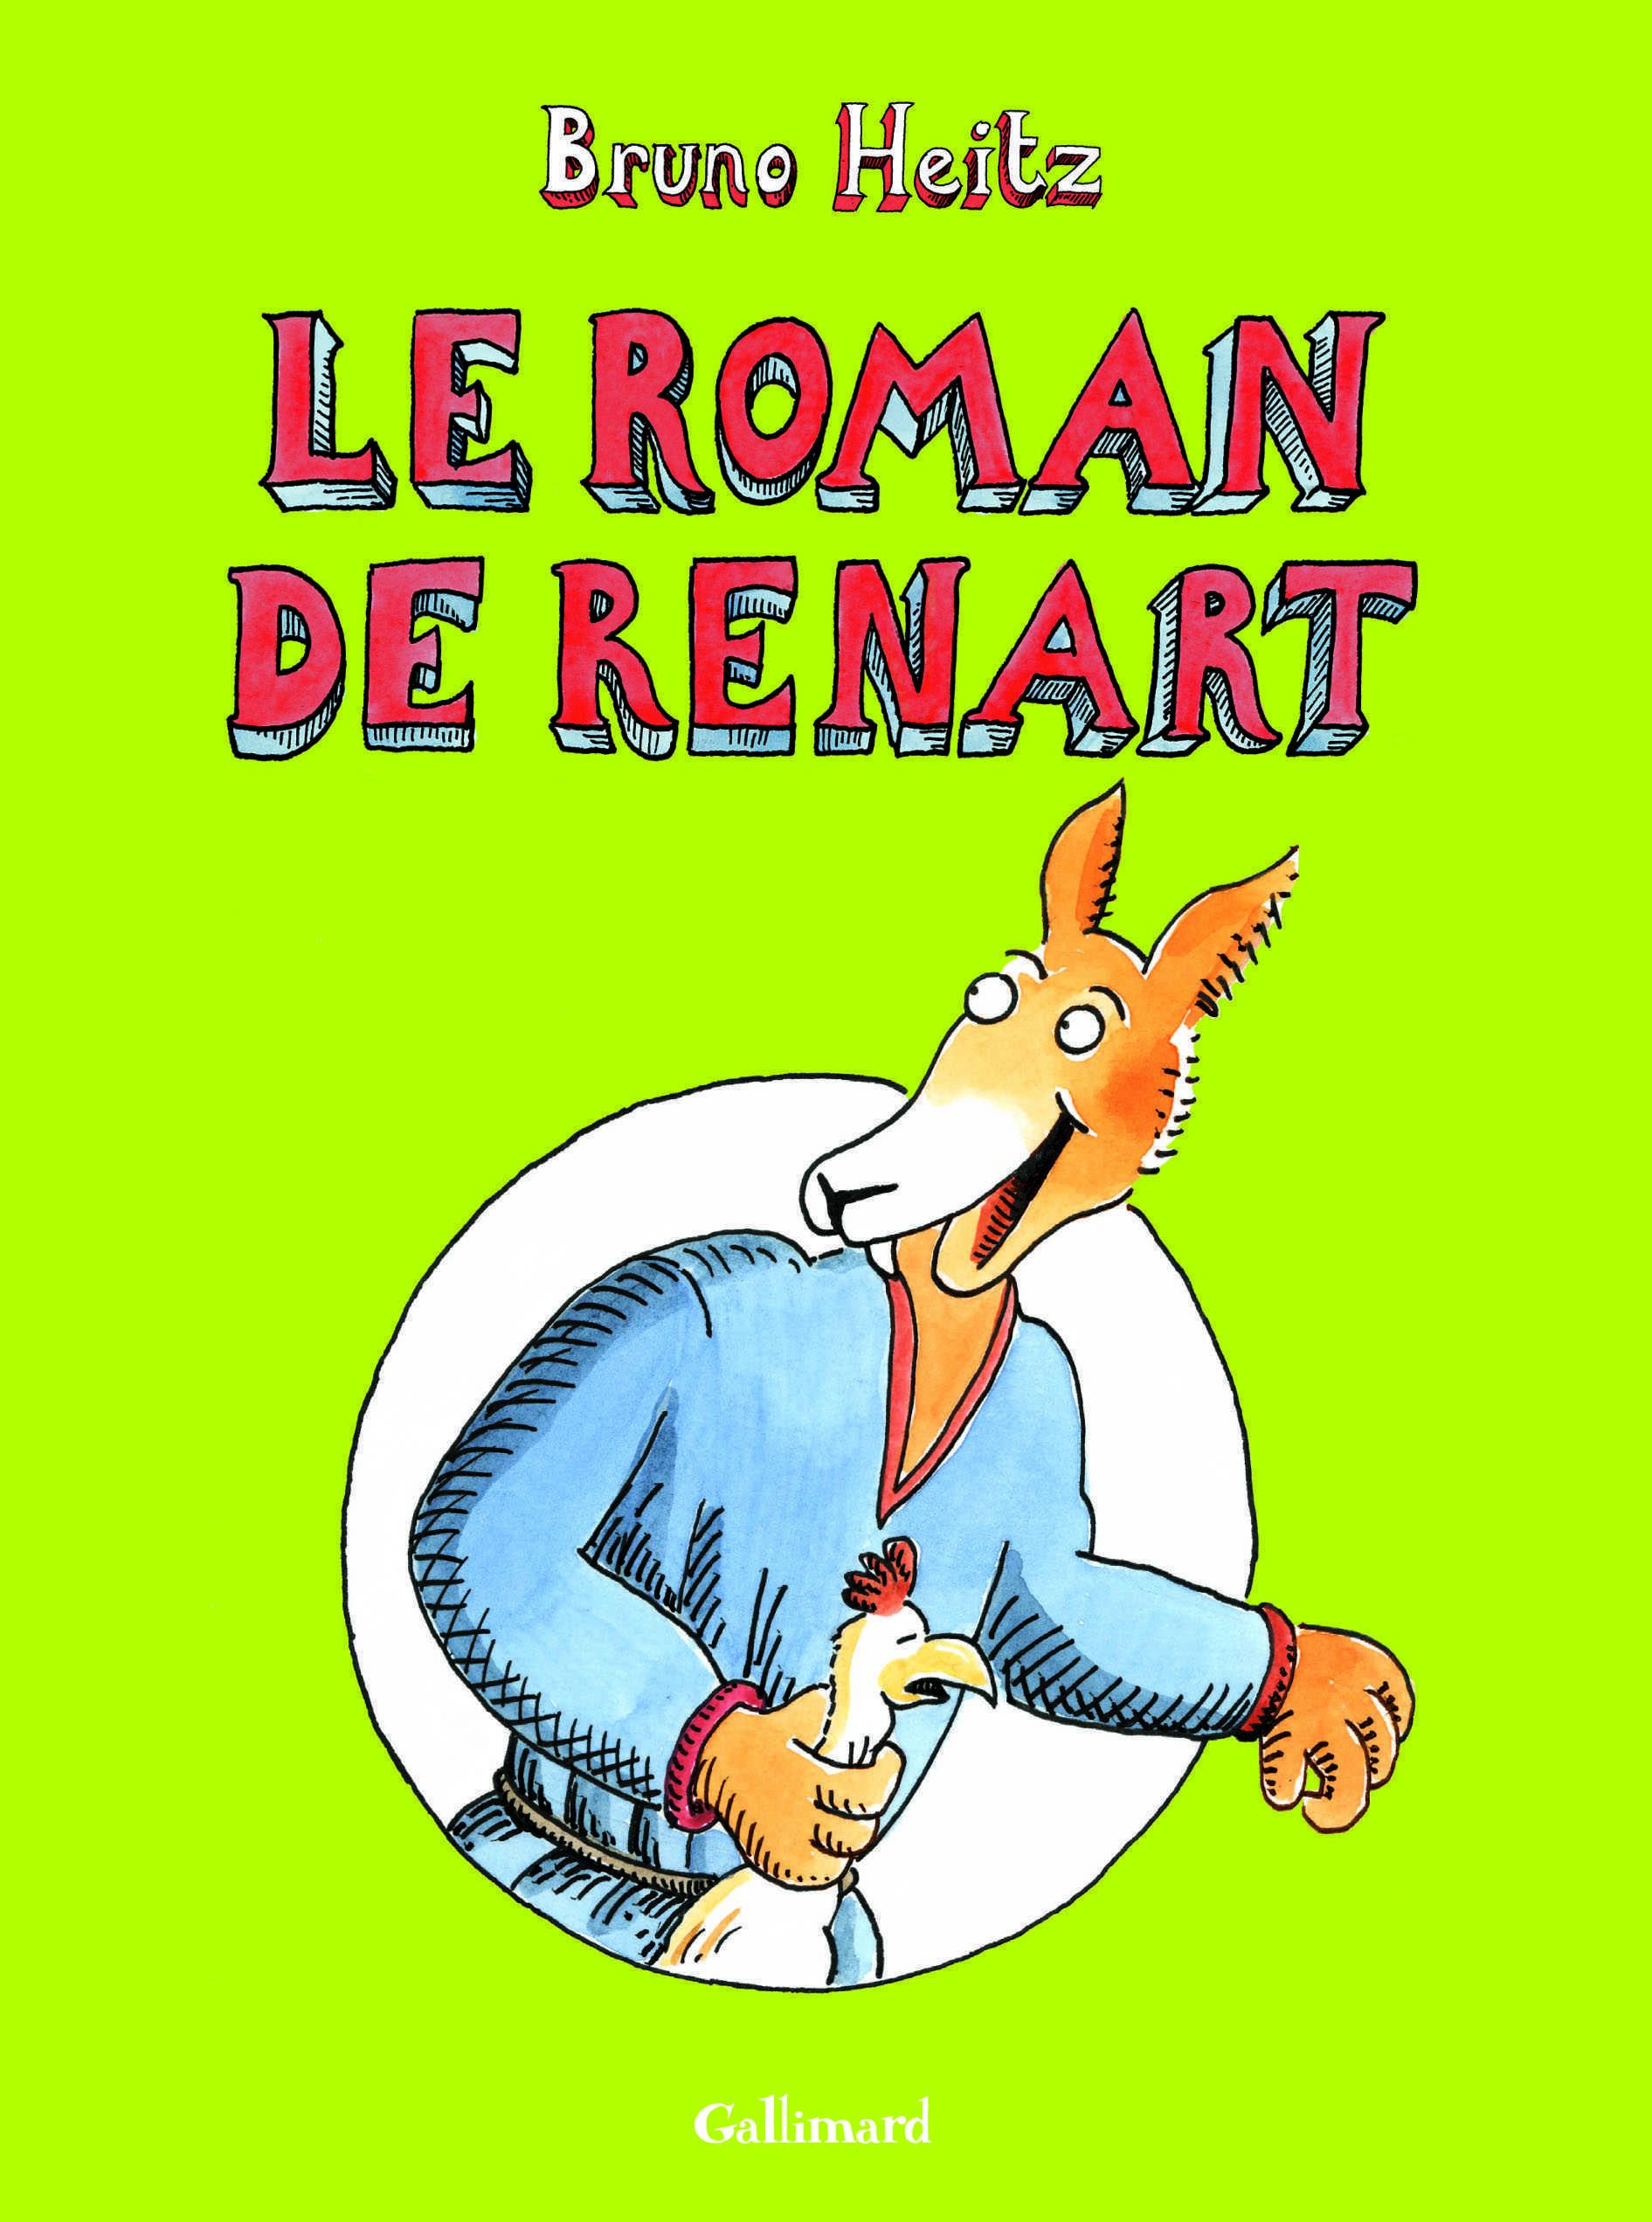 Le Roman de Renart, Bruno Heitz raconte le machiavélique goupil